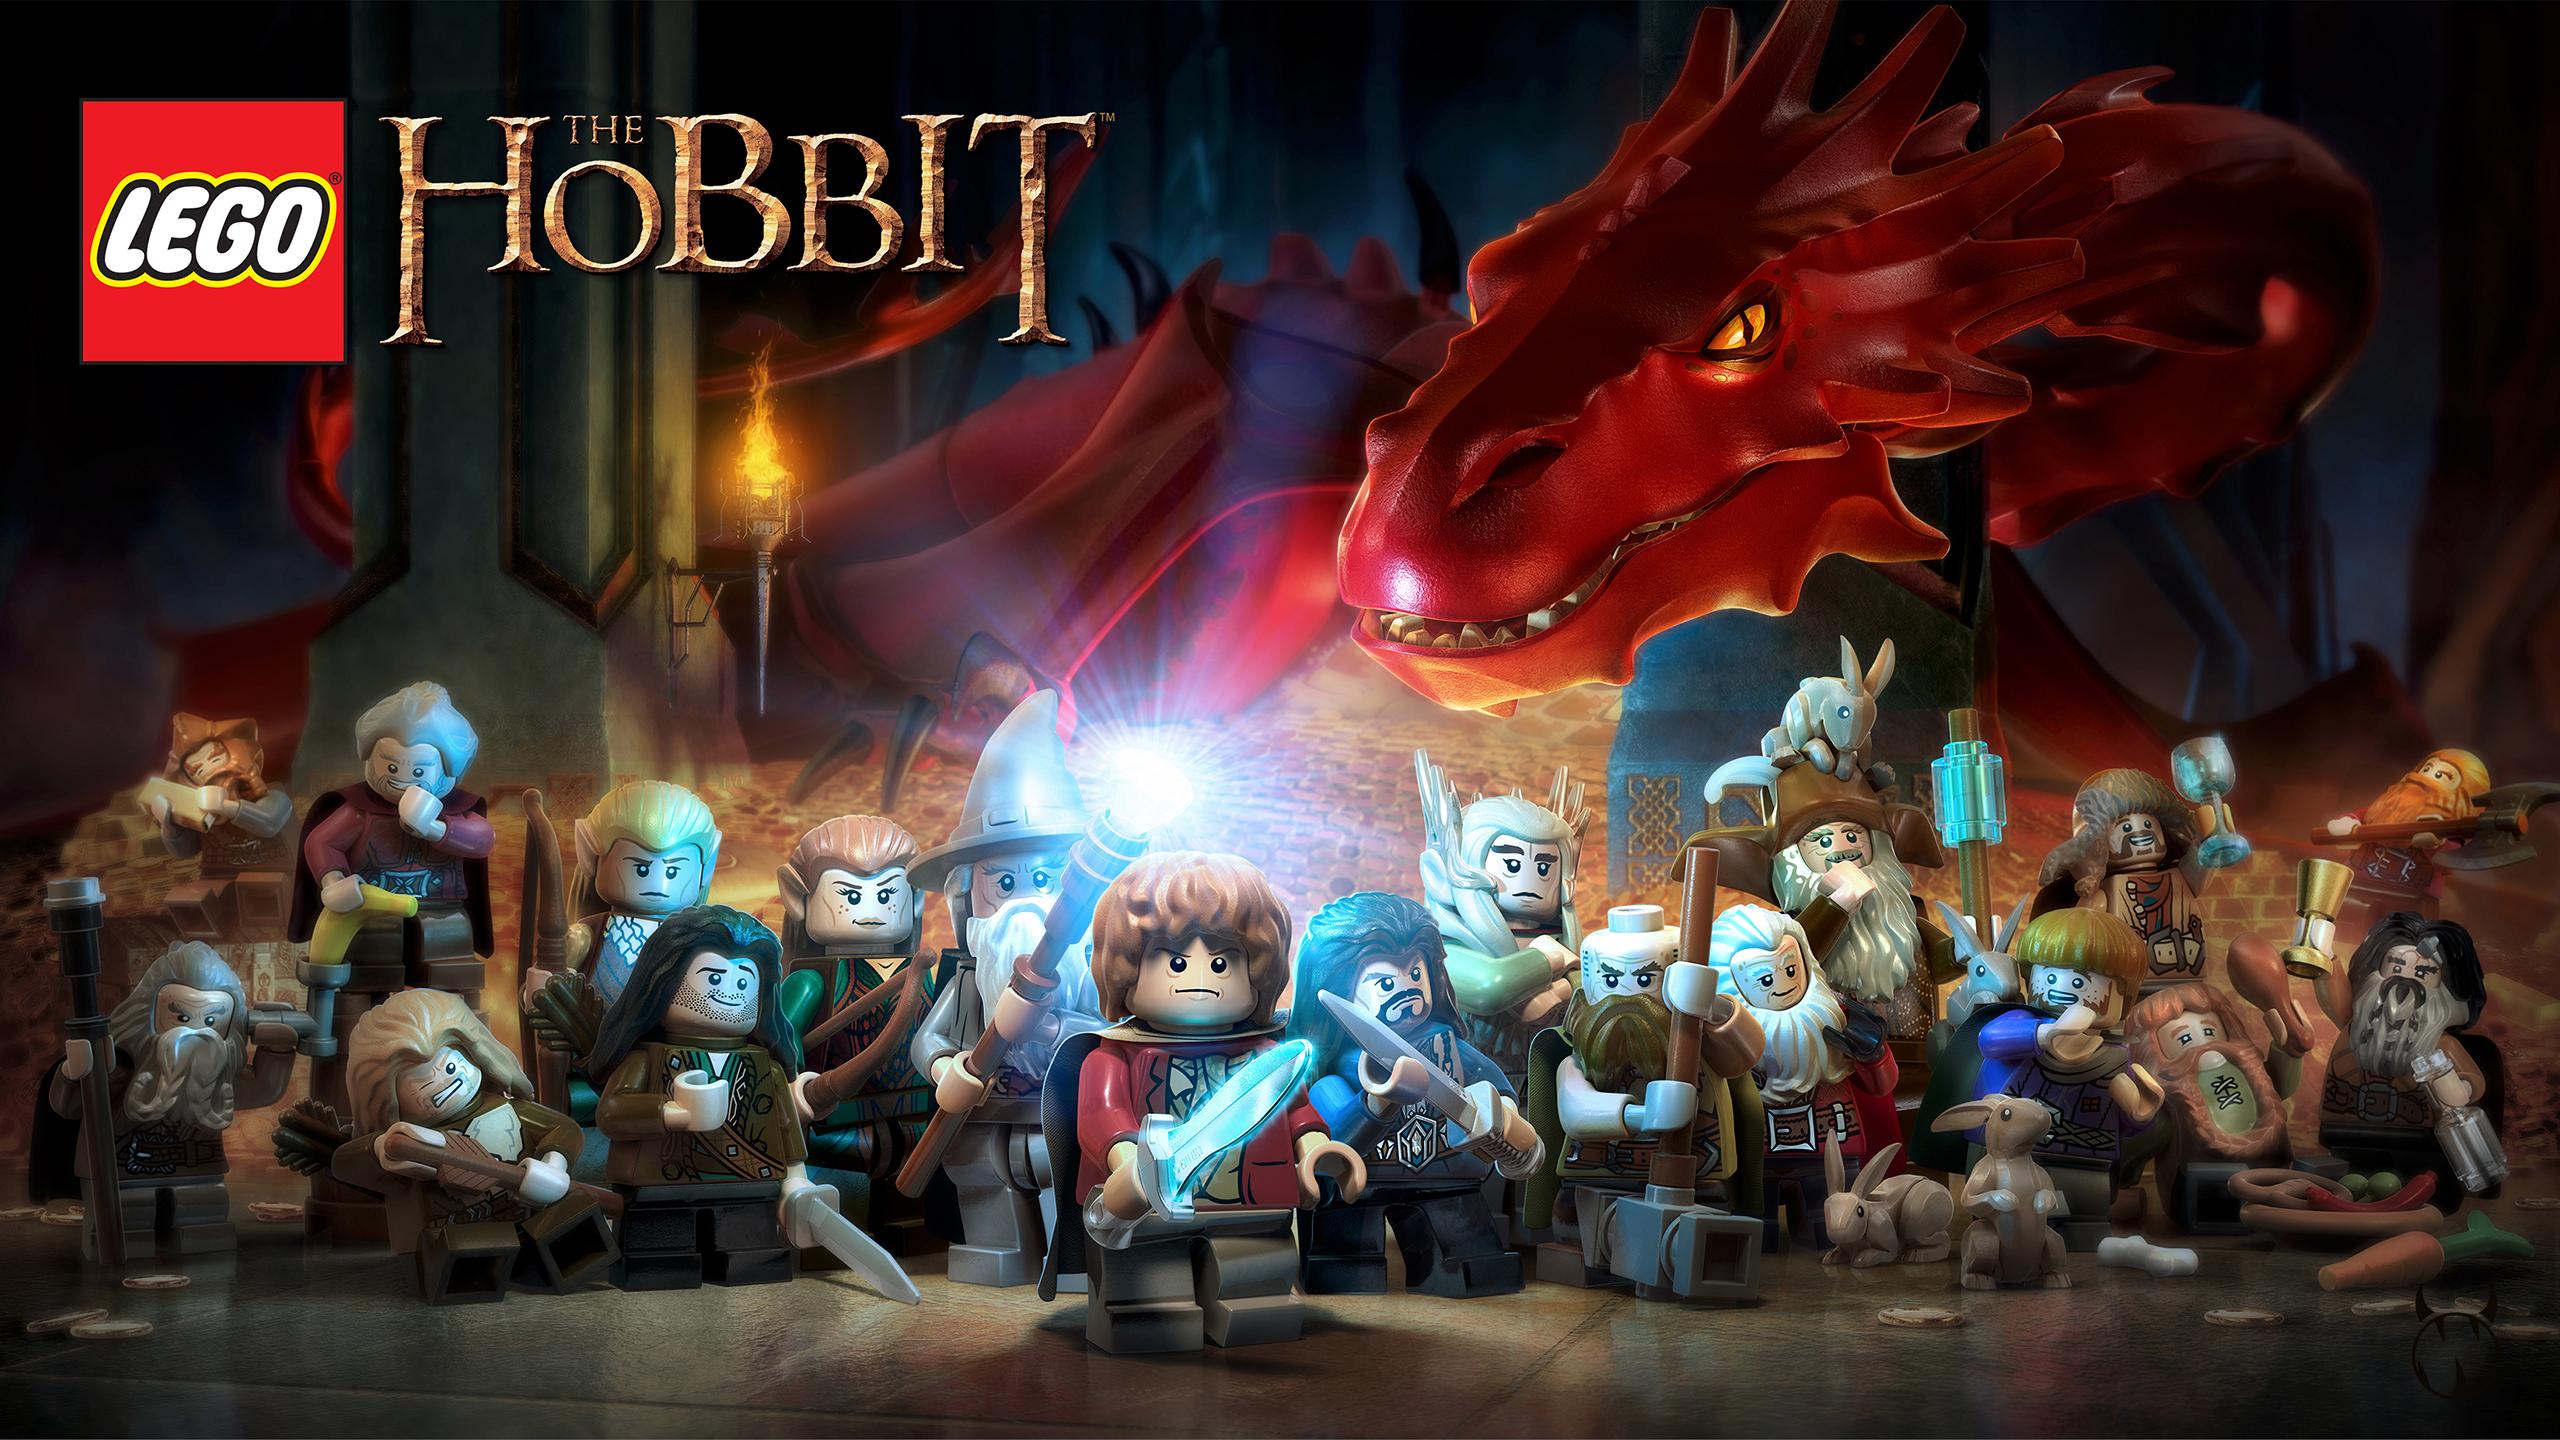 Hobbit astuce et triche